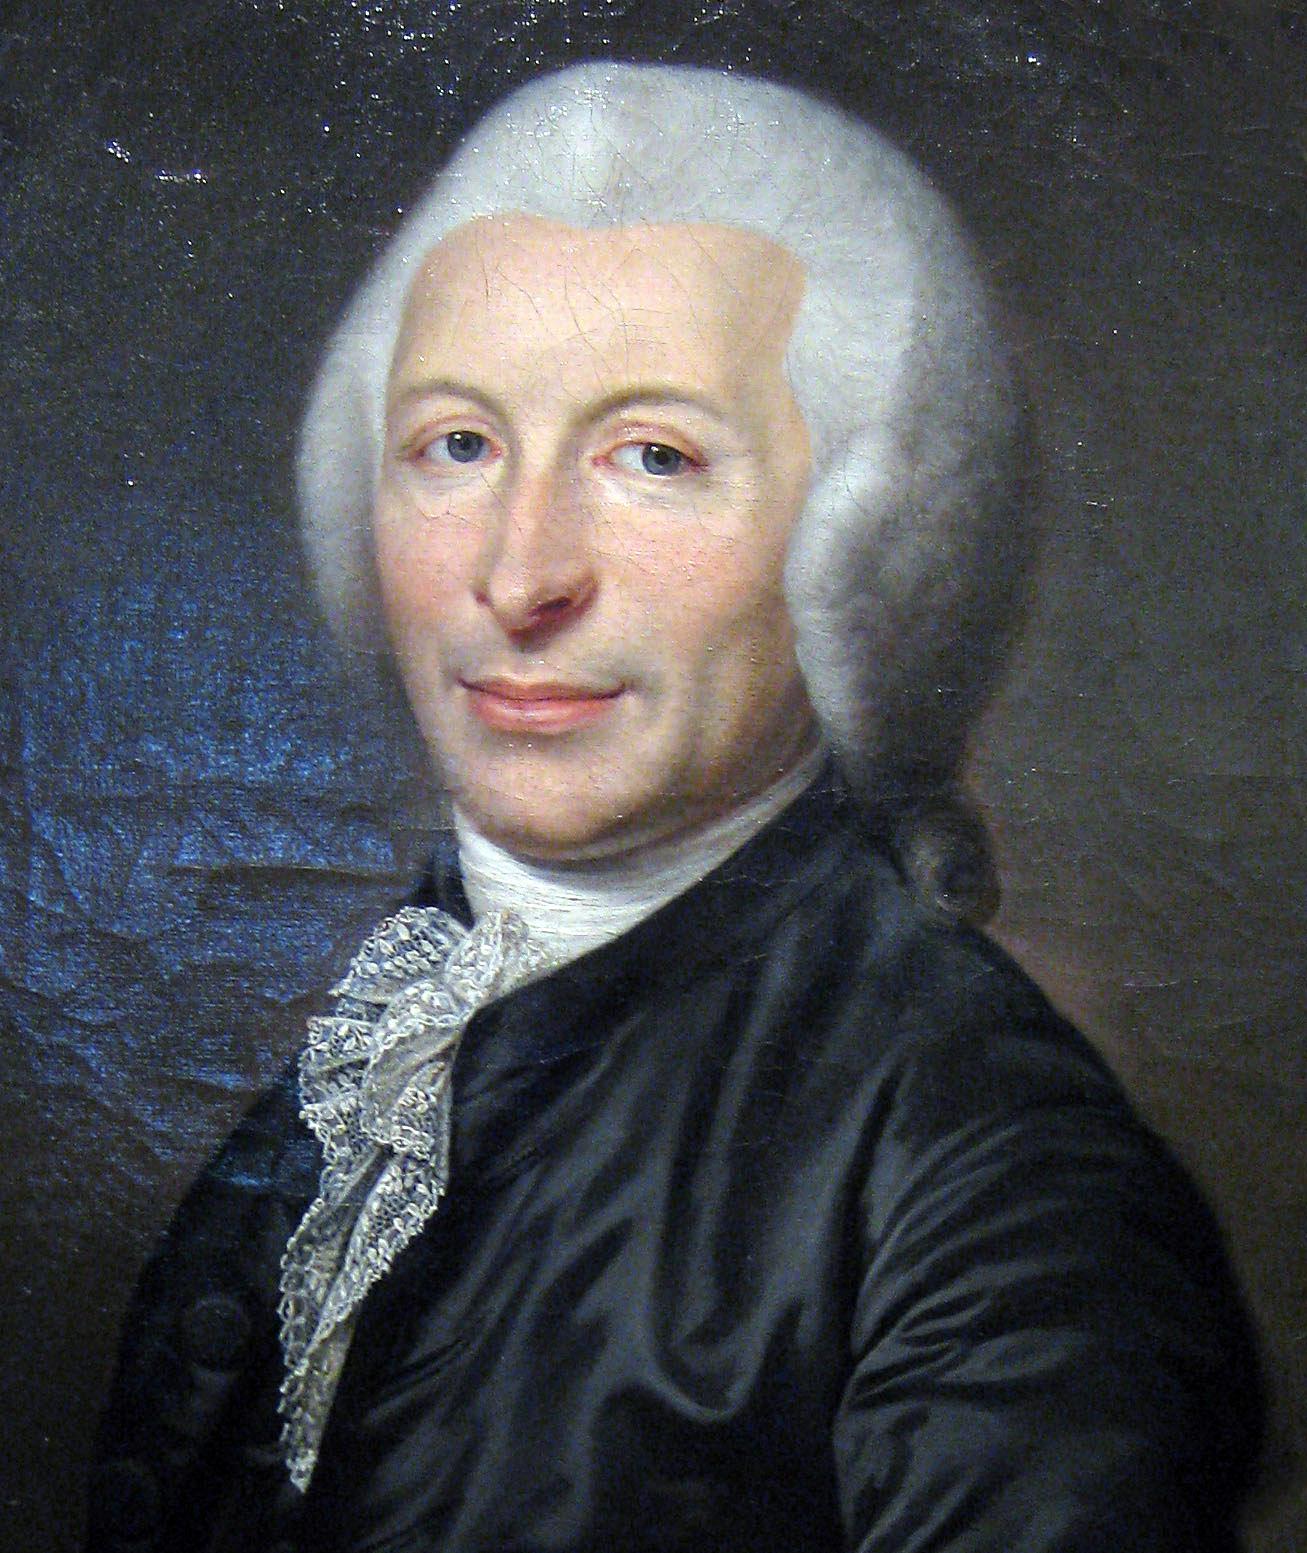 Joseph Ignace Guillotin